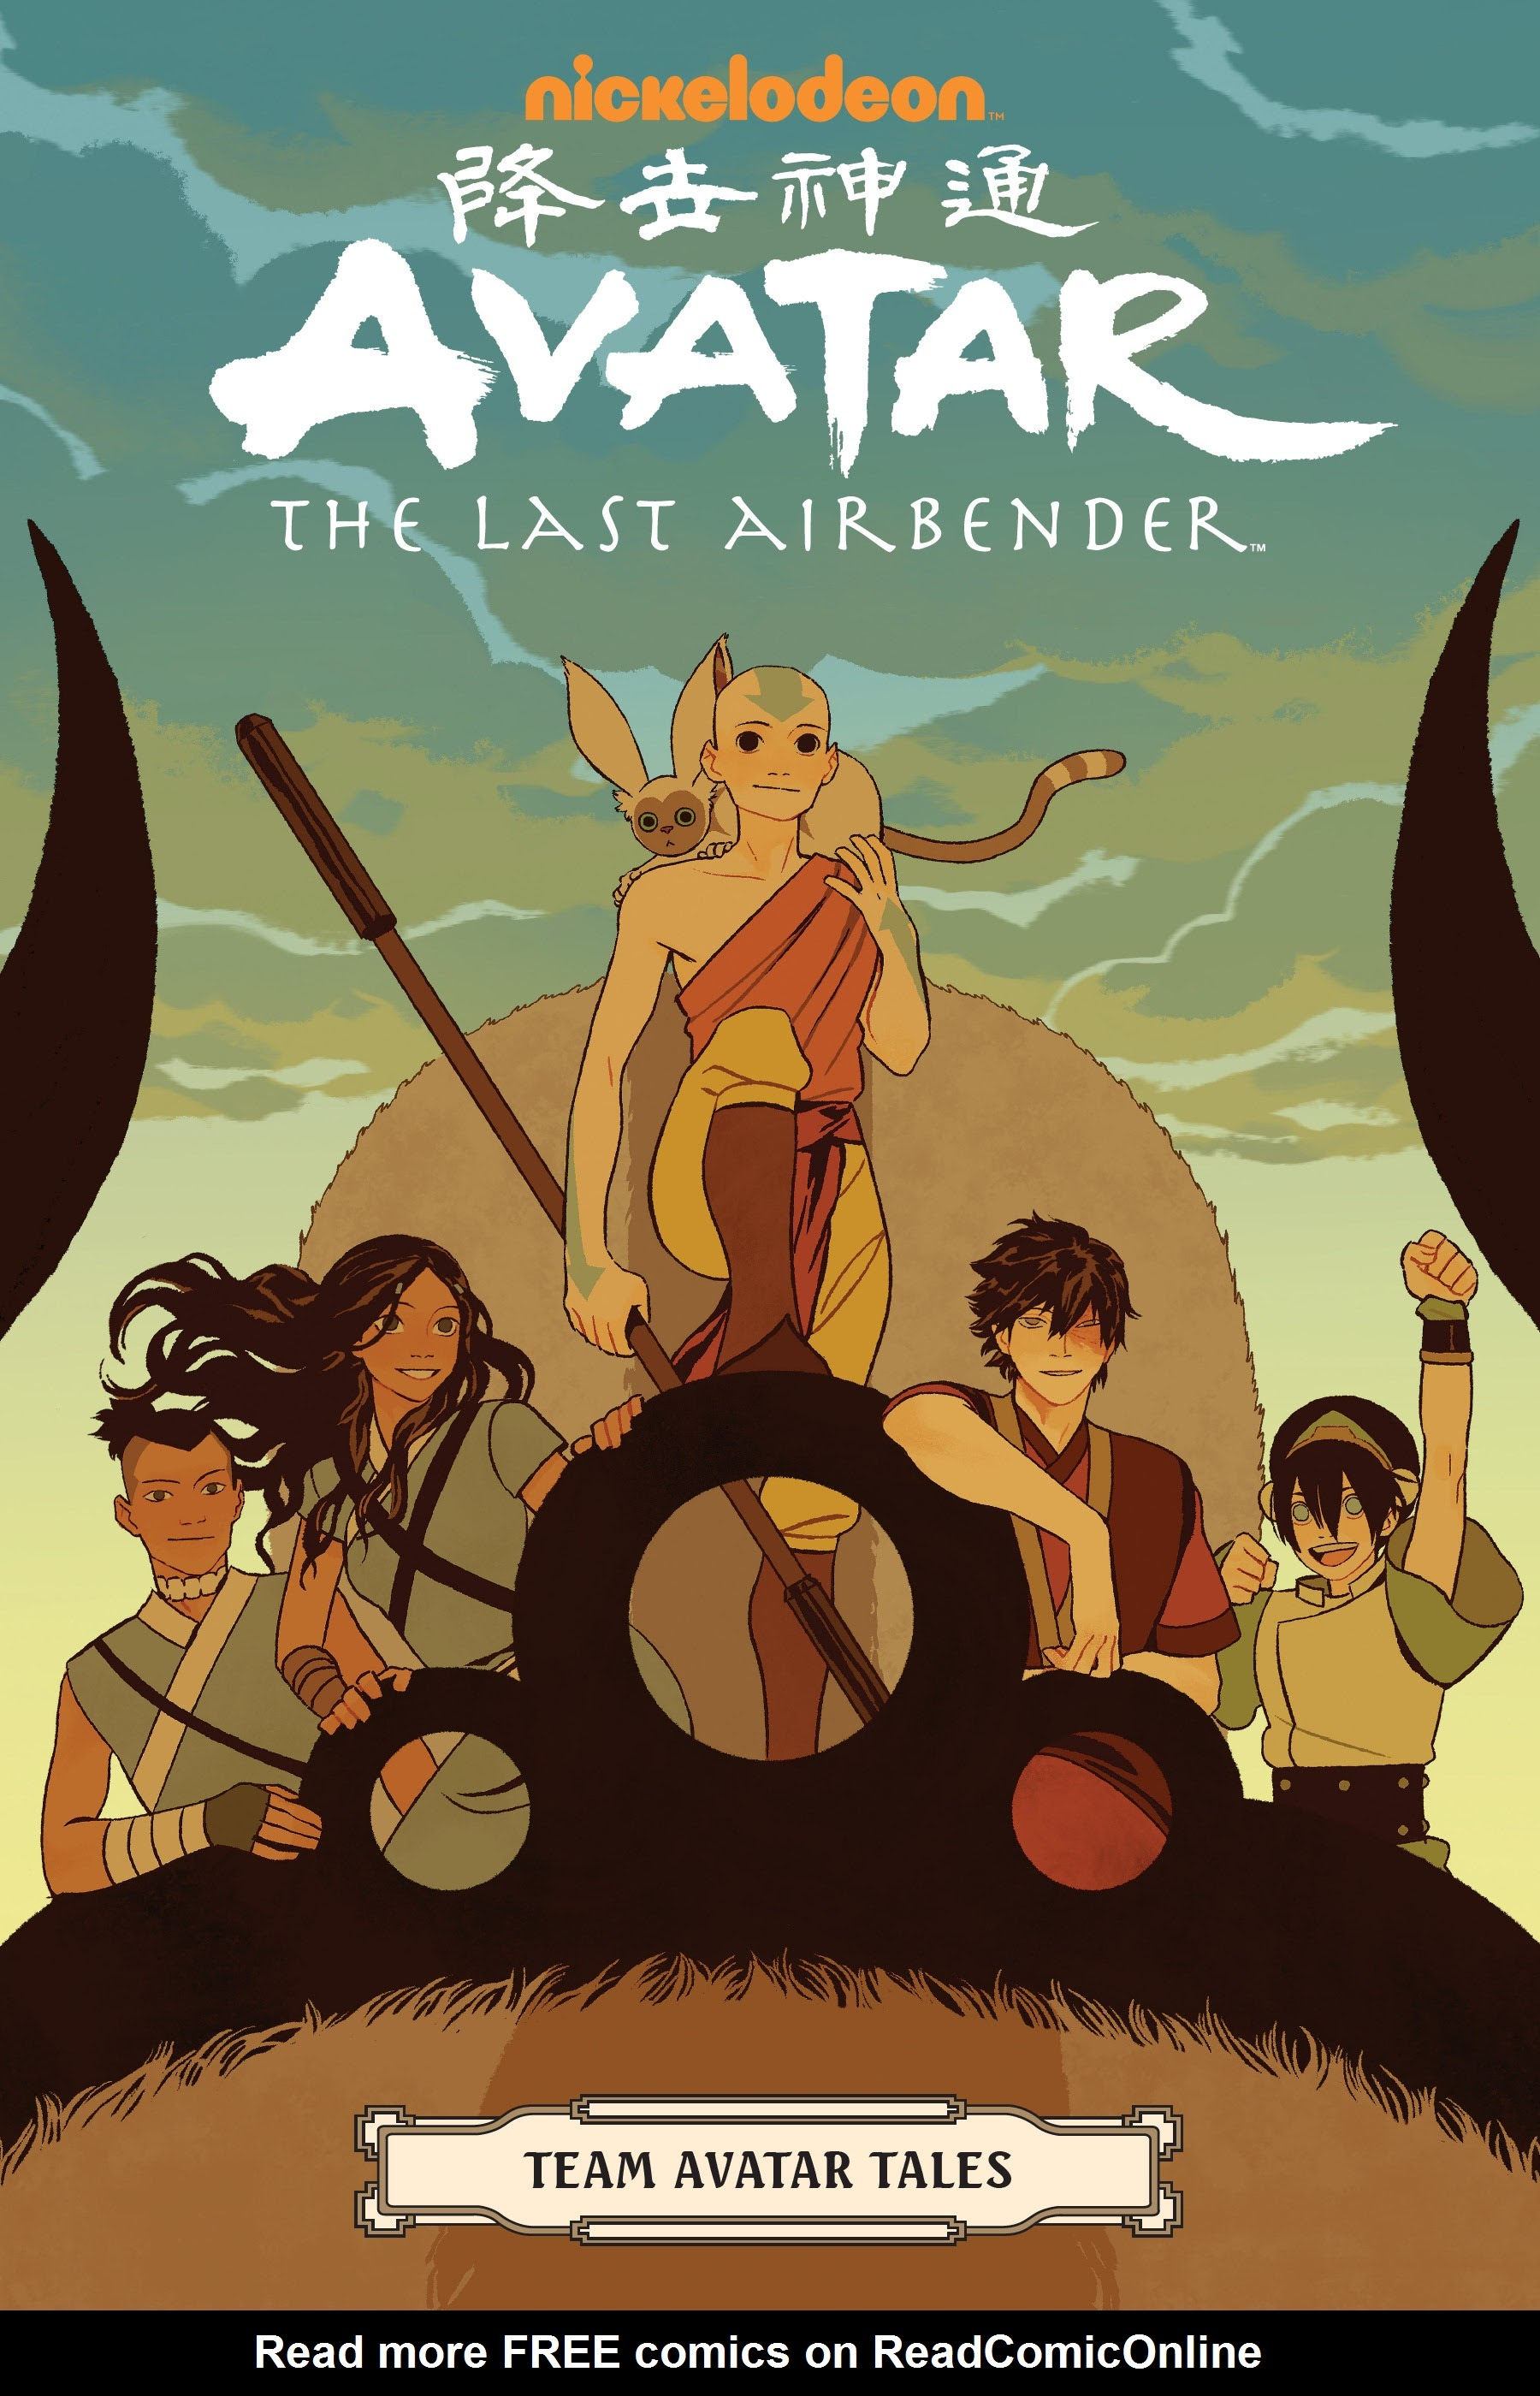 Nickelodeon Avatar: The Last Airbender - Team Avatar Tales TPB Page 1